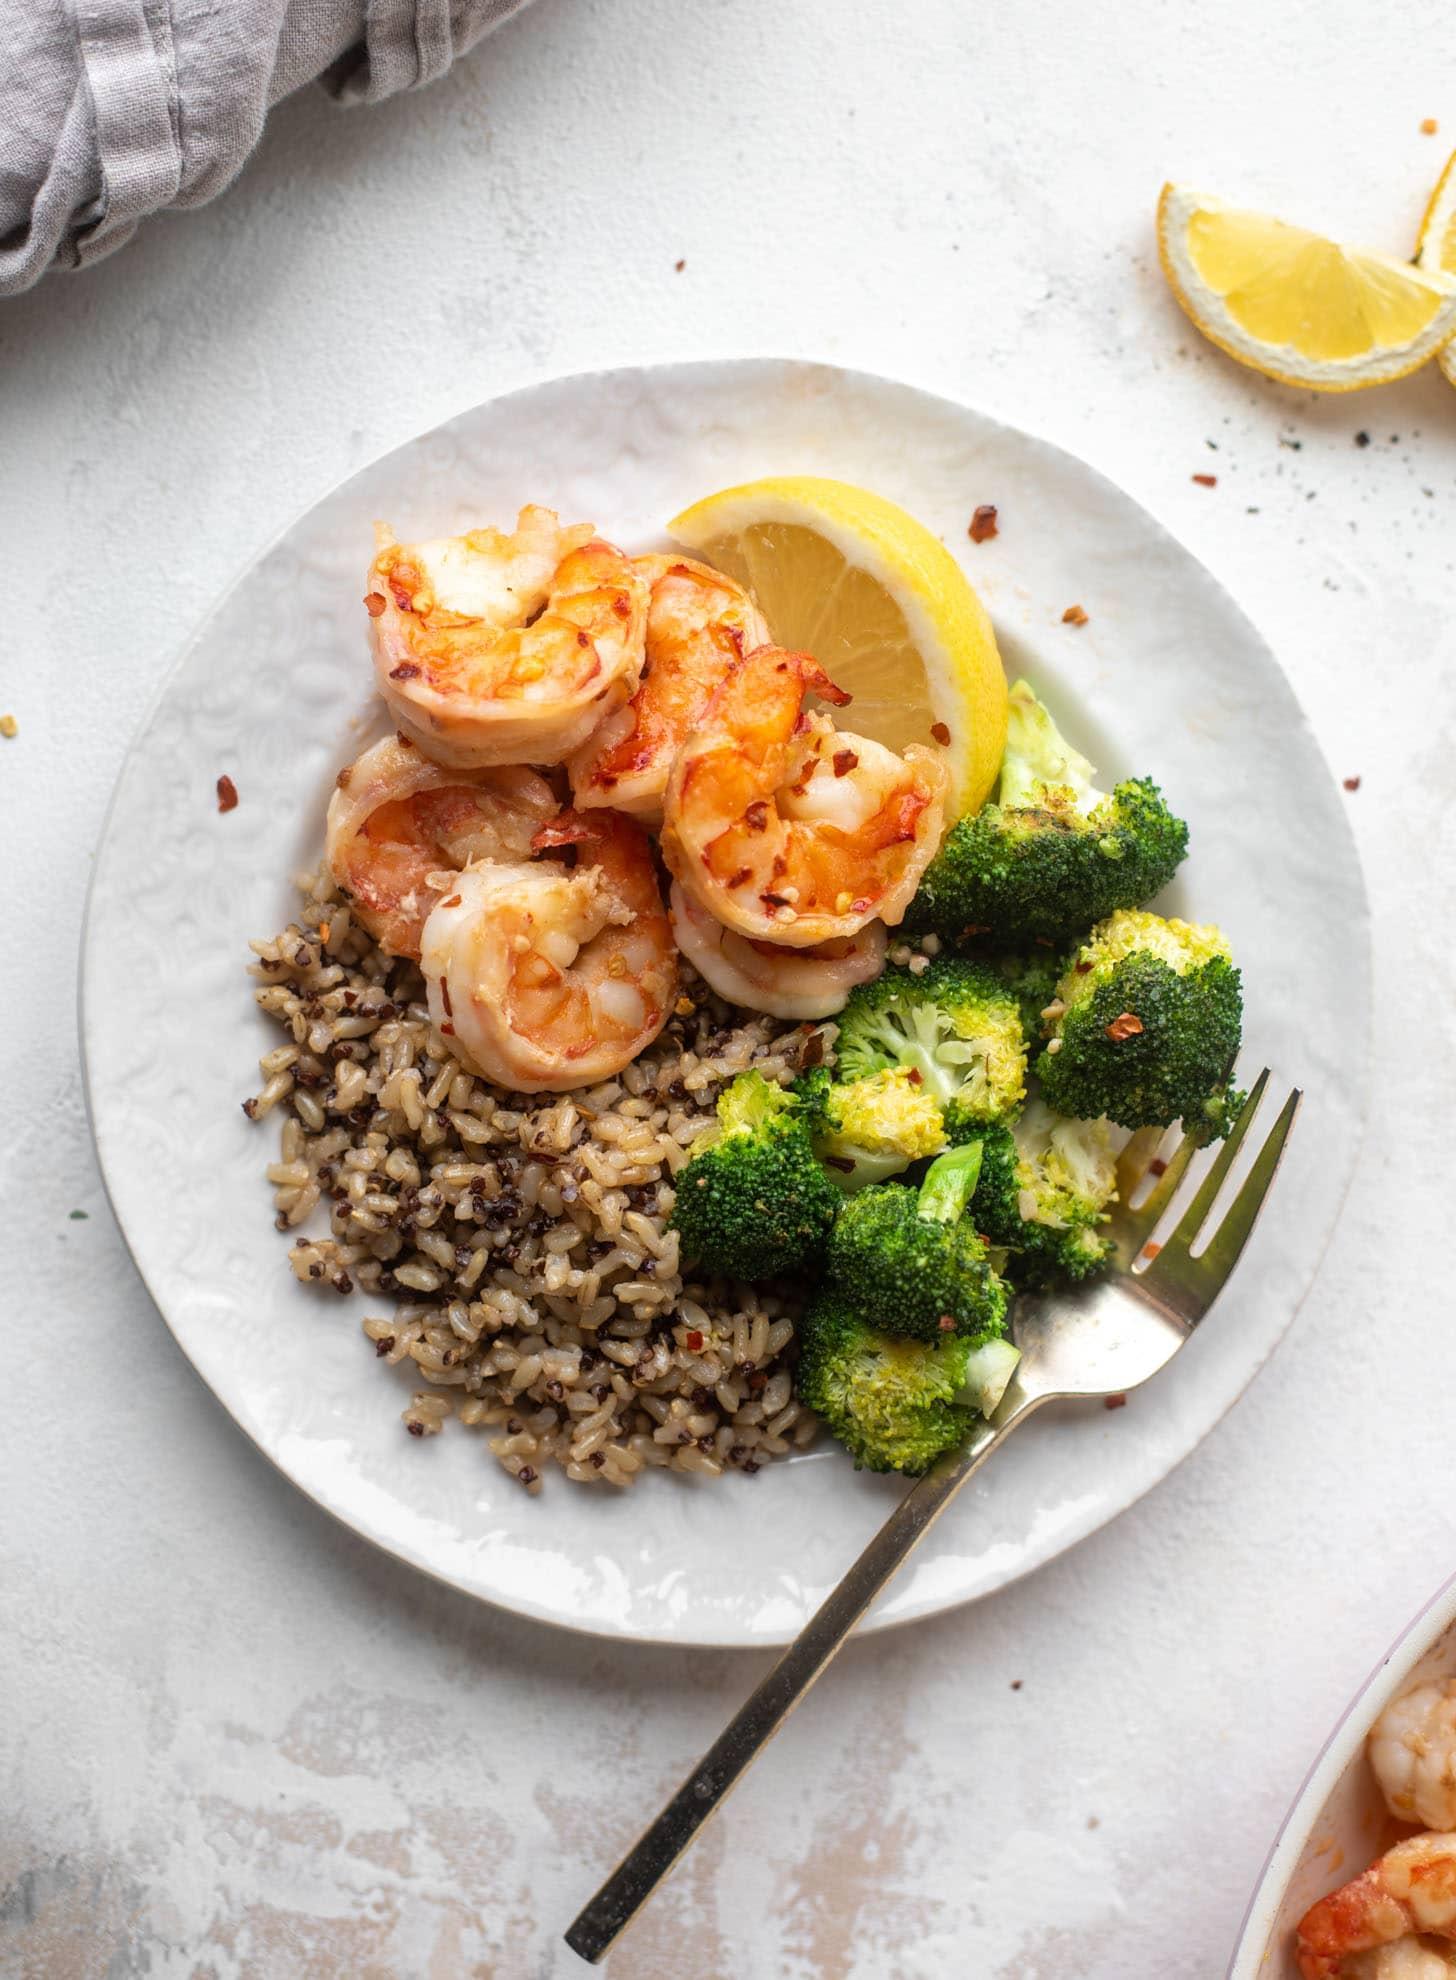 lemon butter shrimp and broccoli with quinoa